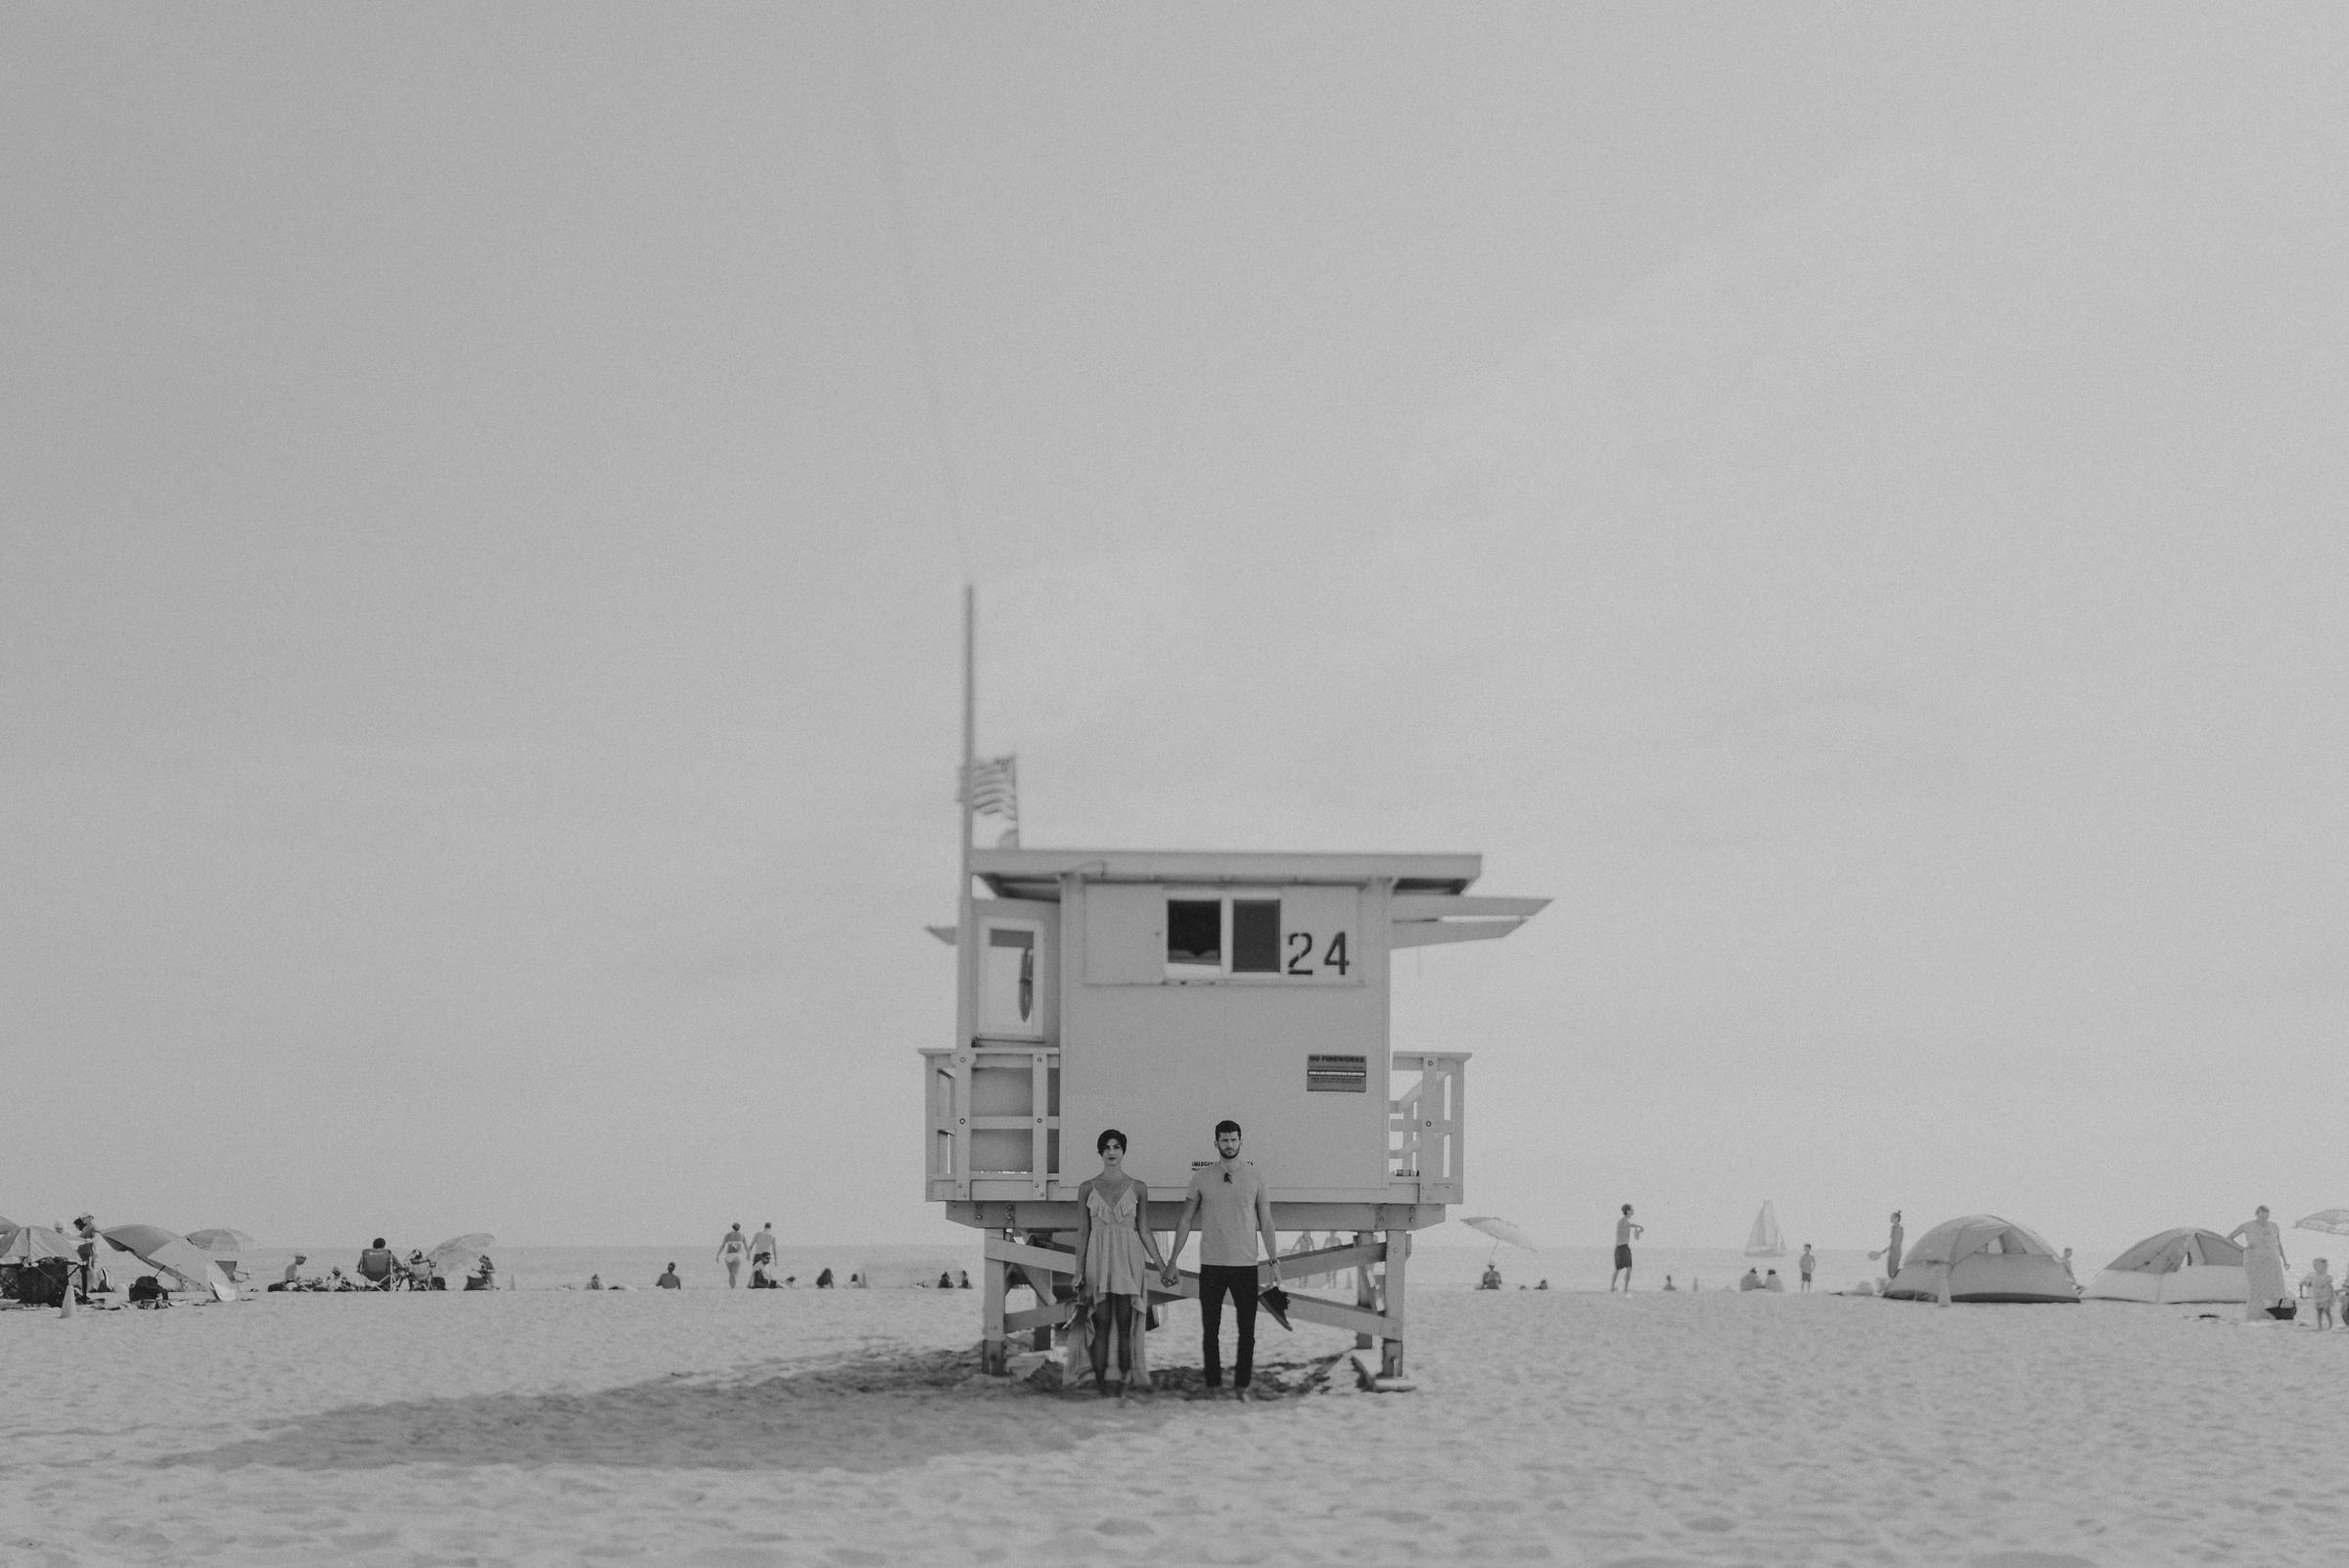 Isaiah + Taylor Photography - Venice Beach & Santa Monica Engagement Session, Los Angeles Wedding Photographer-067.jpg